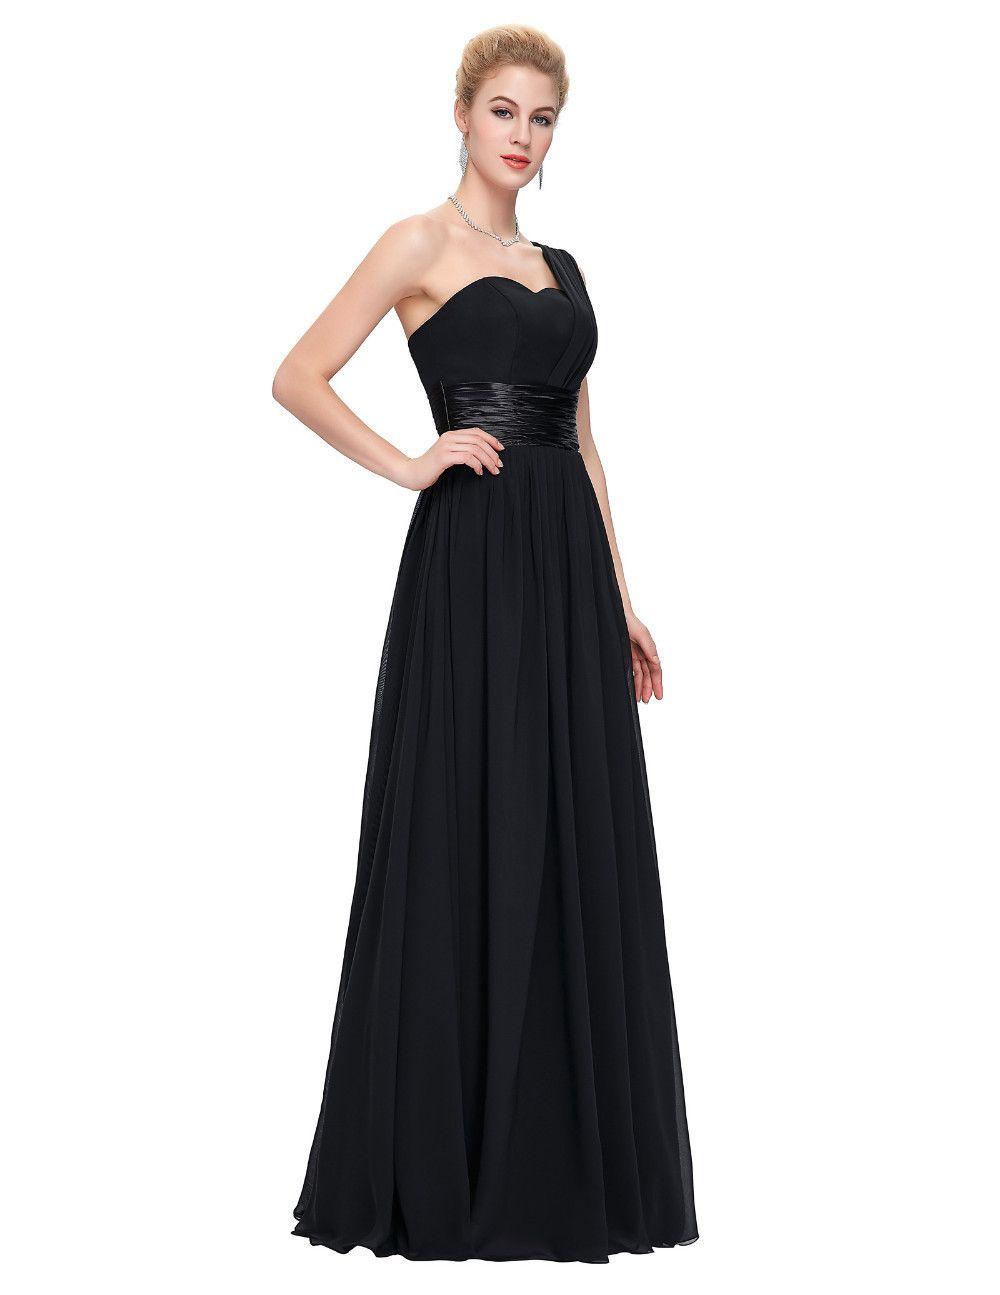 Wholesale Mother of Groom Dresses - Buy 2014 New Design